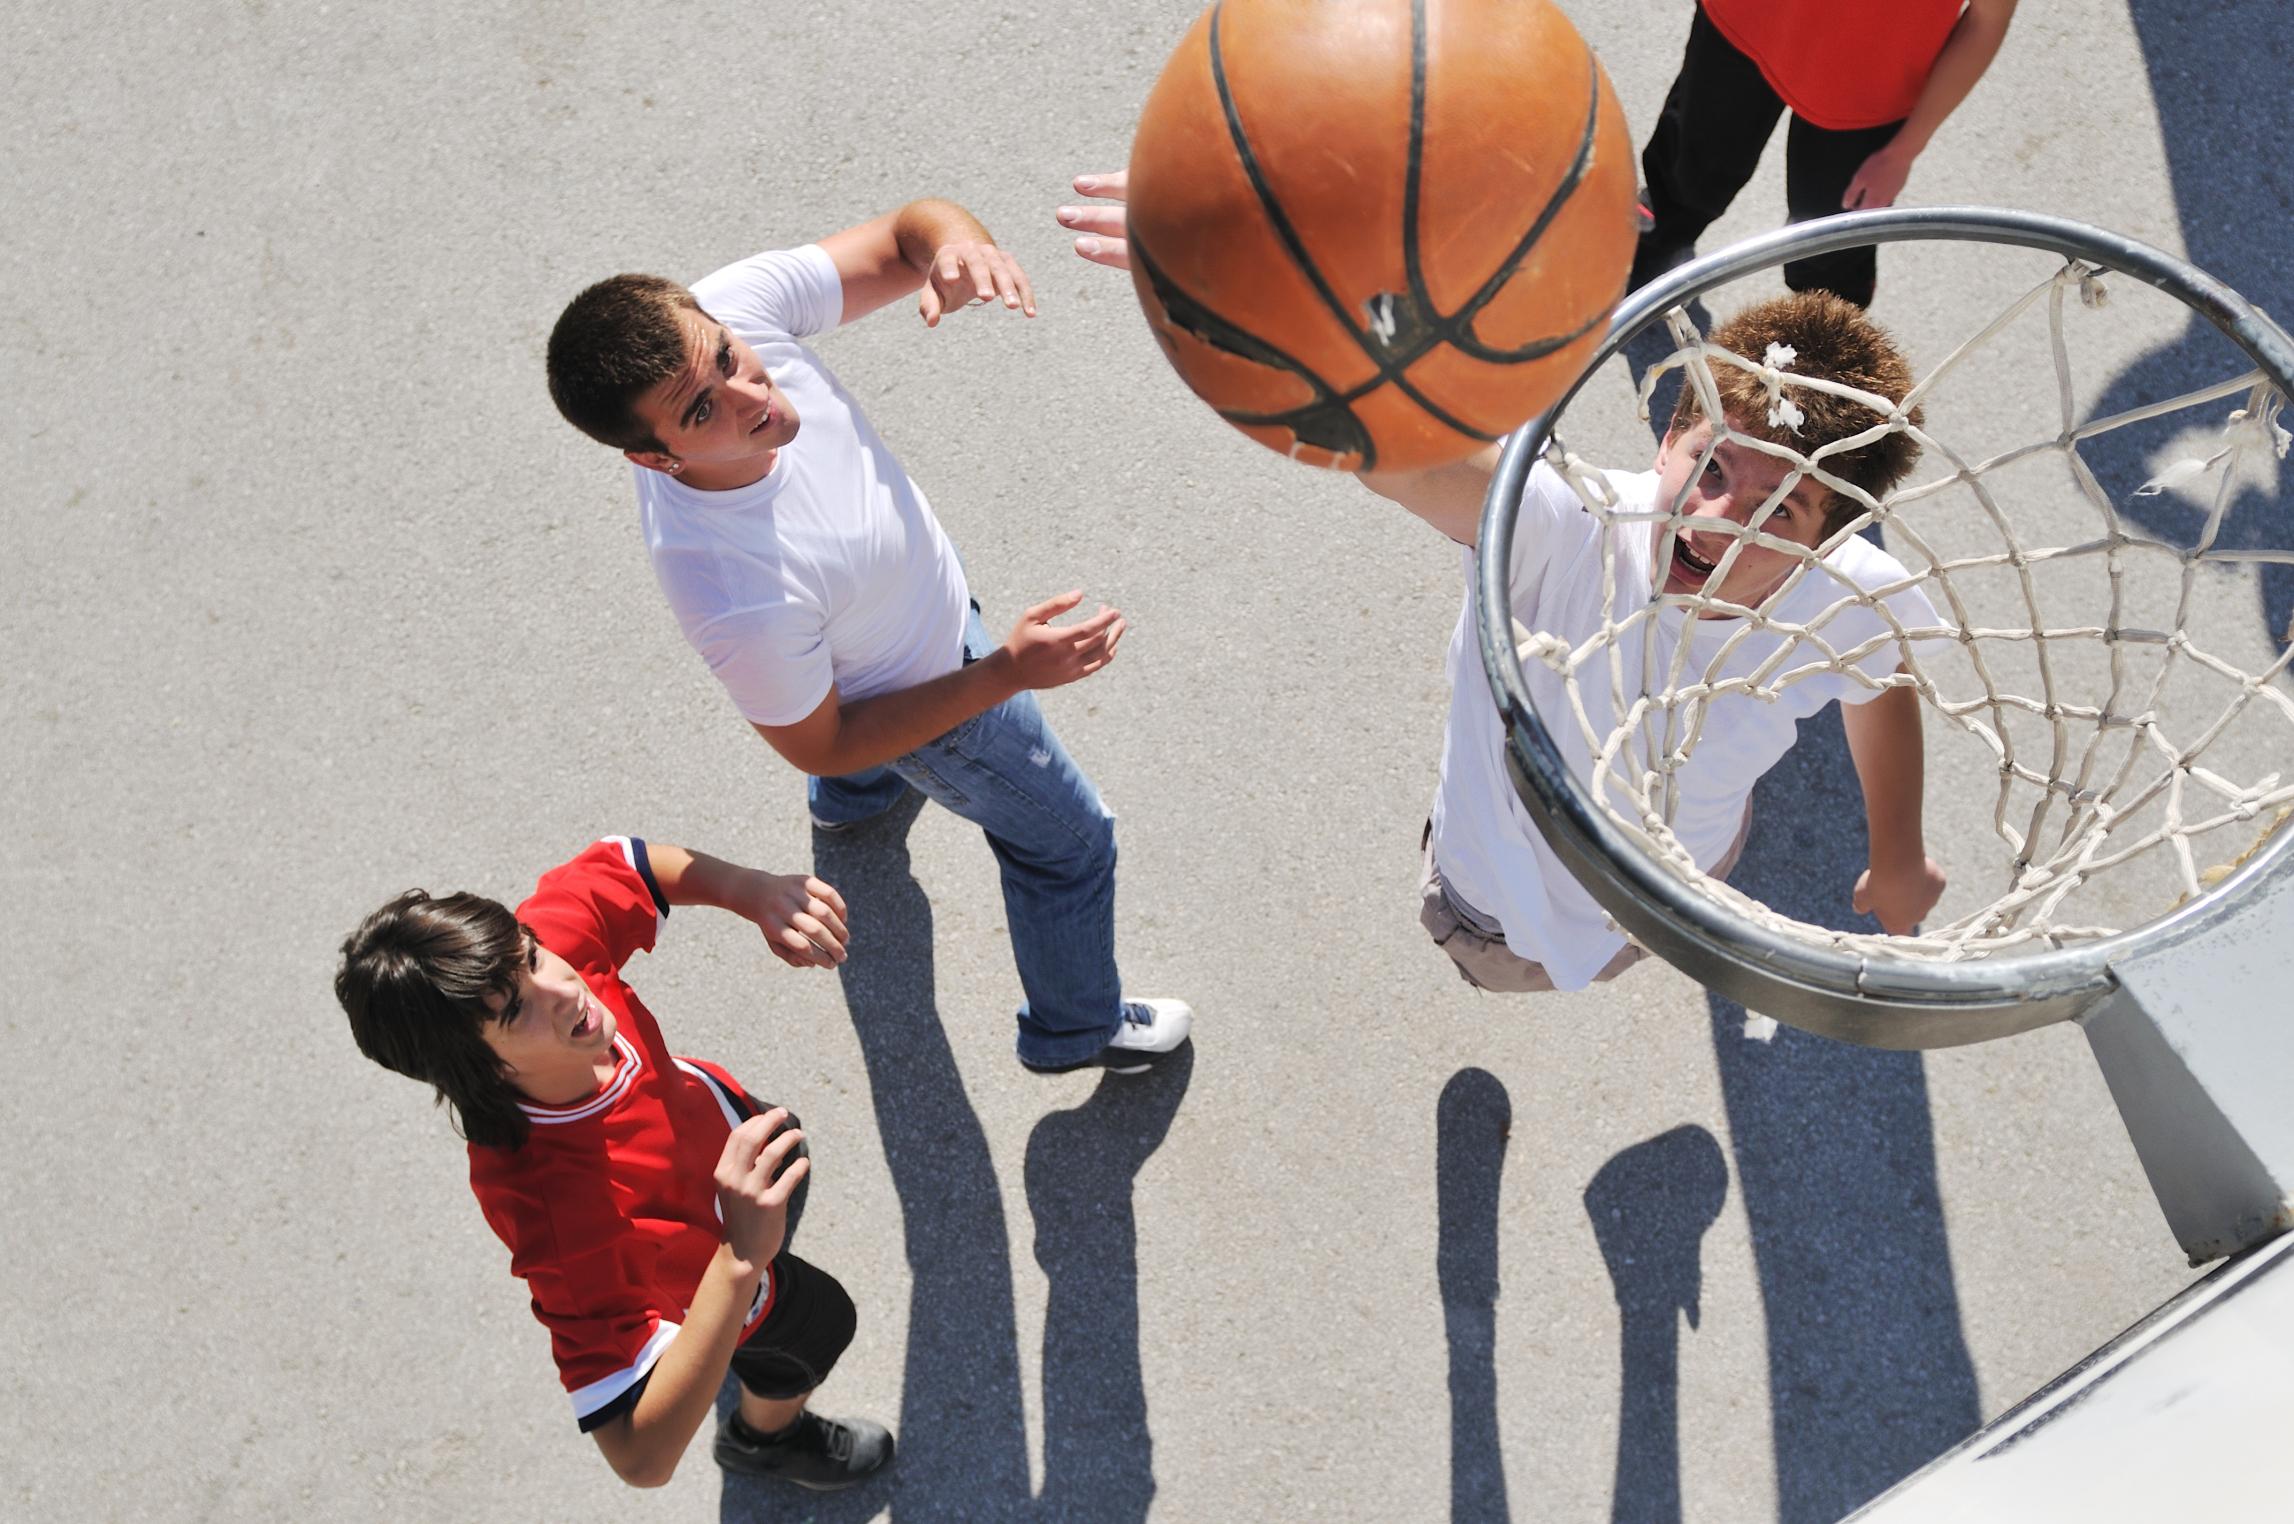 Fun Basketball Games For Practice